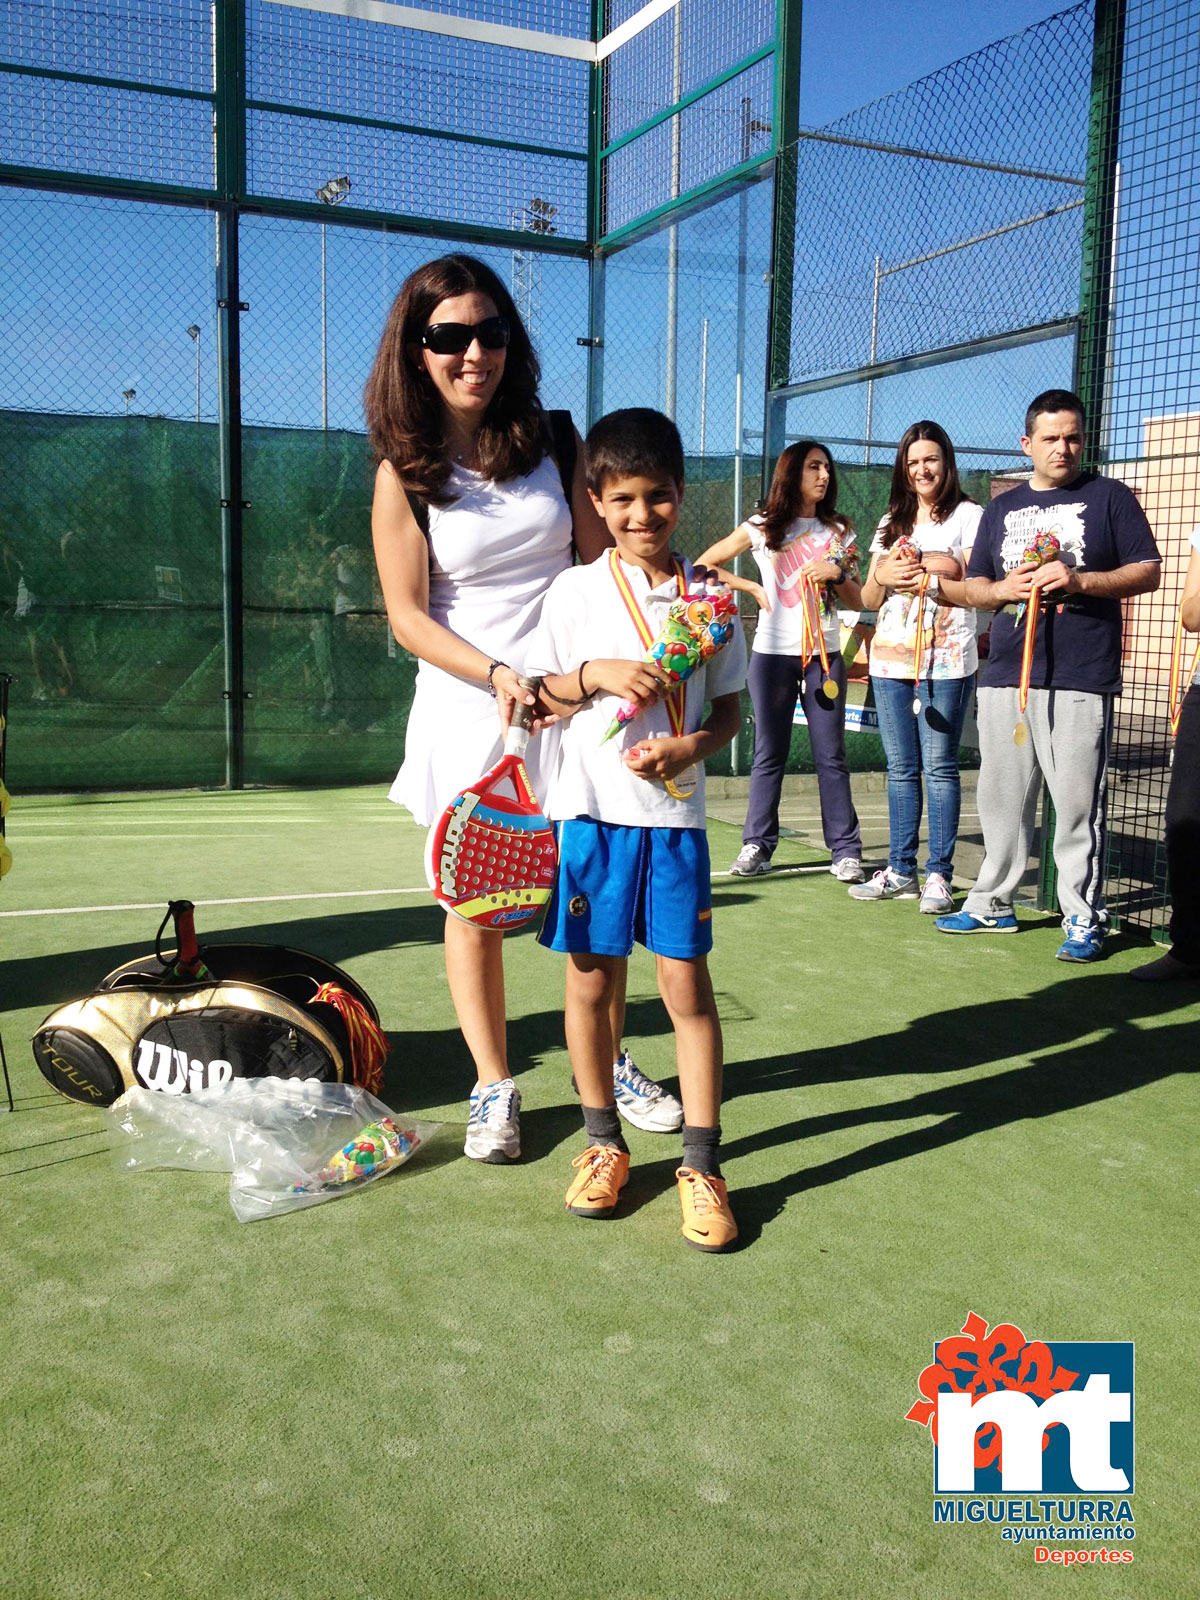 Celebrada la jornada de pádel infantil de la Escuela Deportiva de Miguelturra